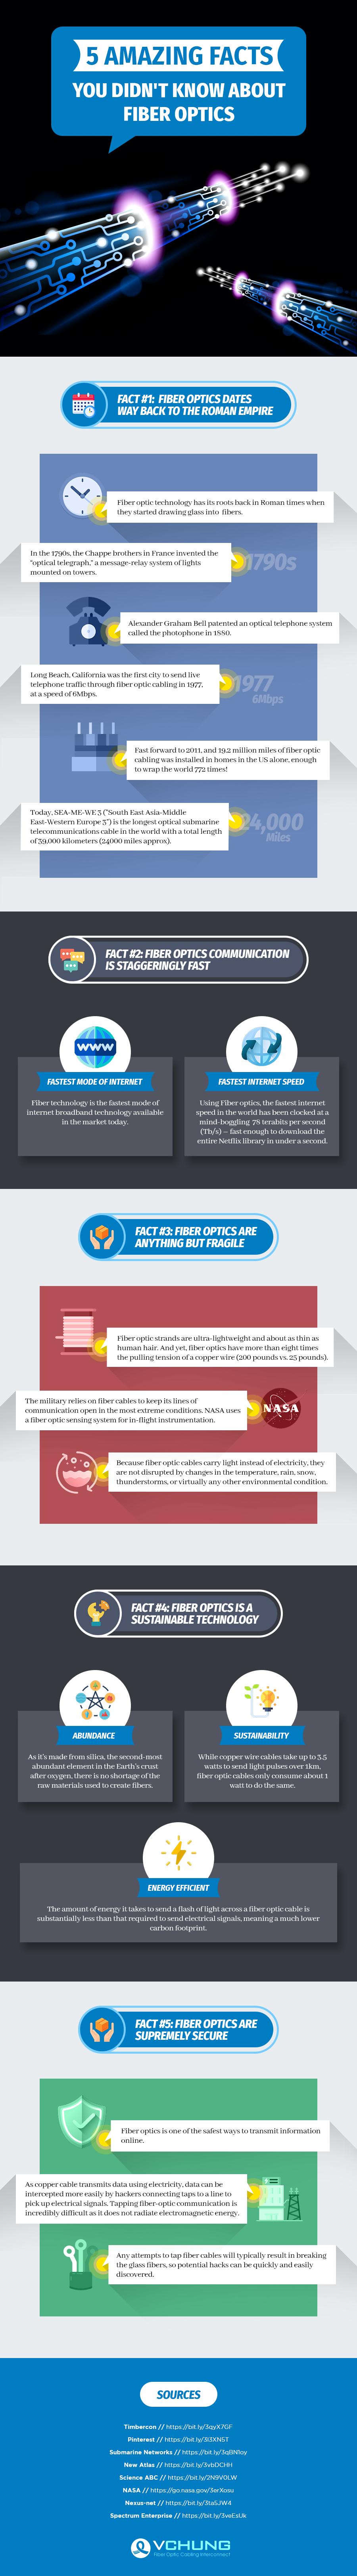 fiber optics facts infographic